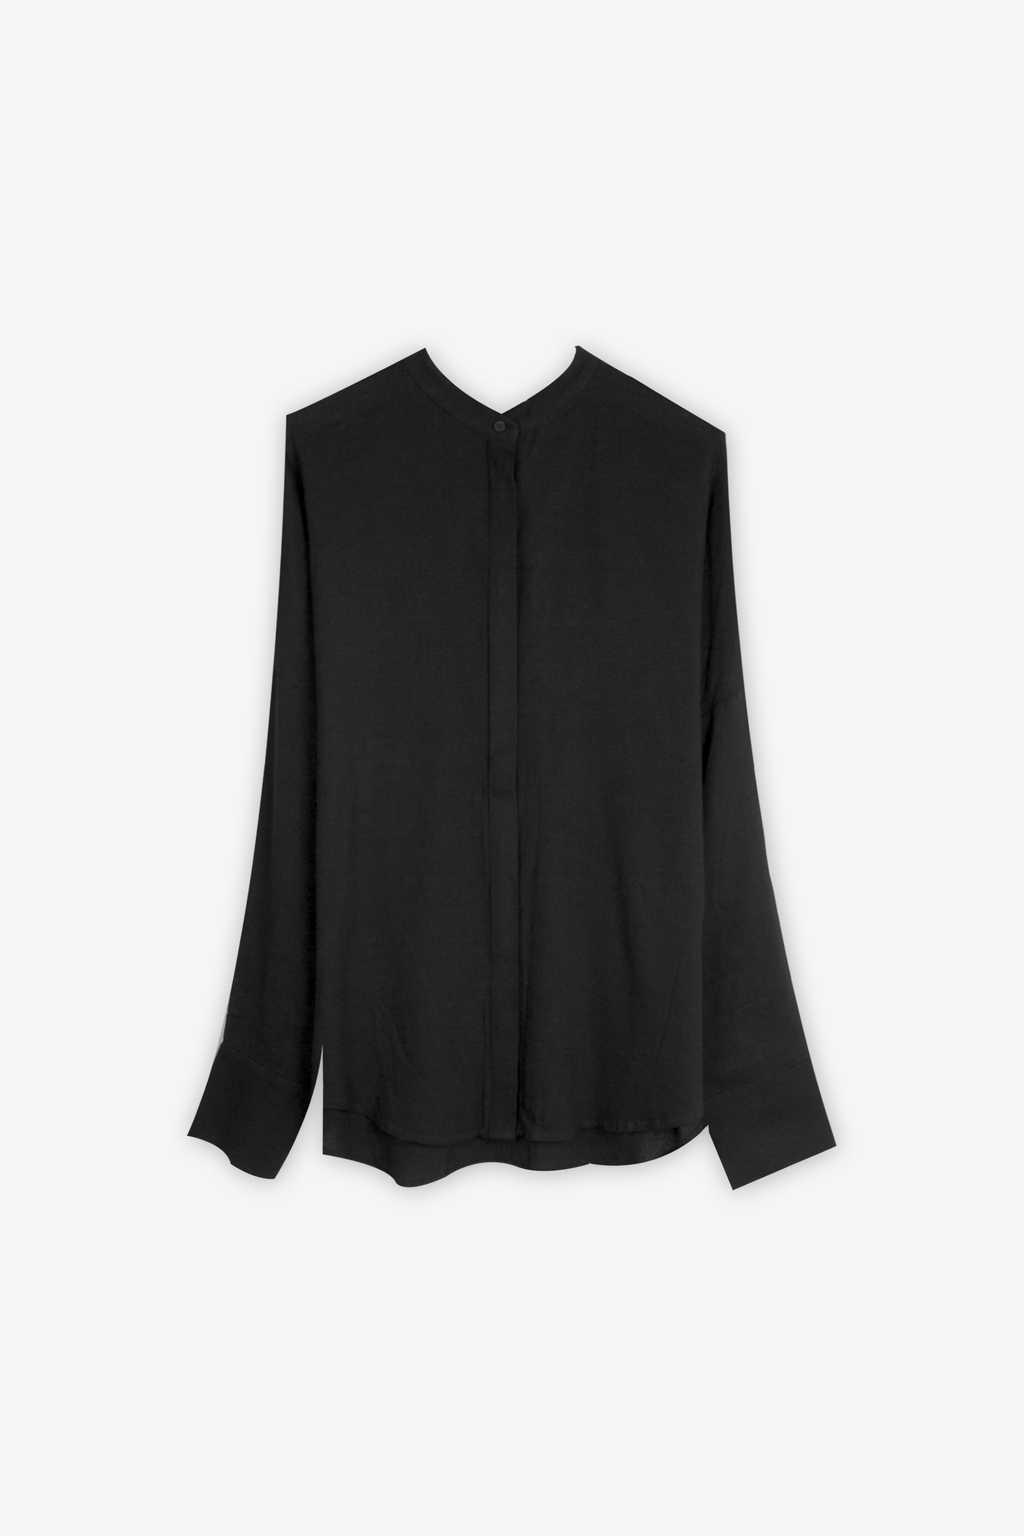 Blouse 1195 Black 6